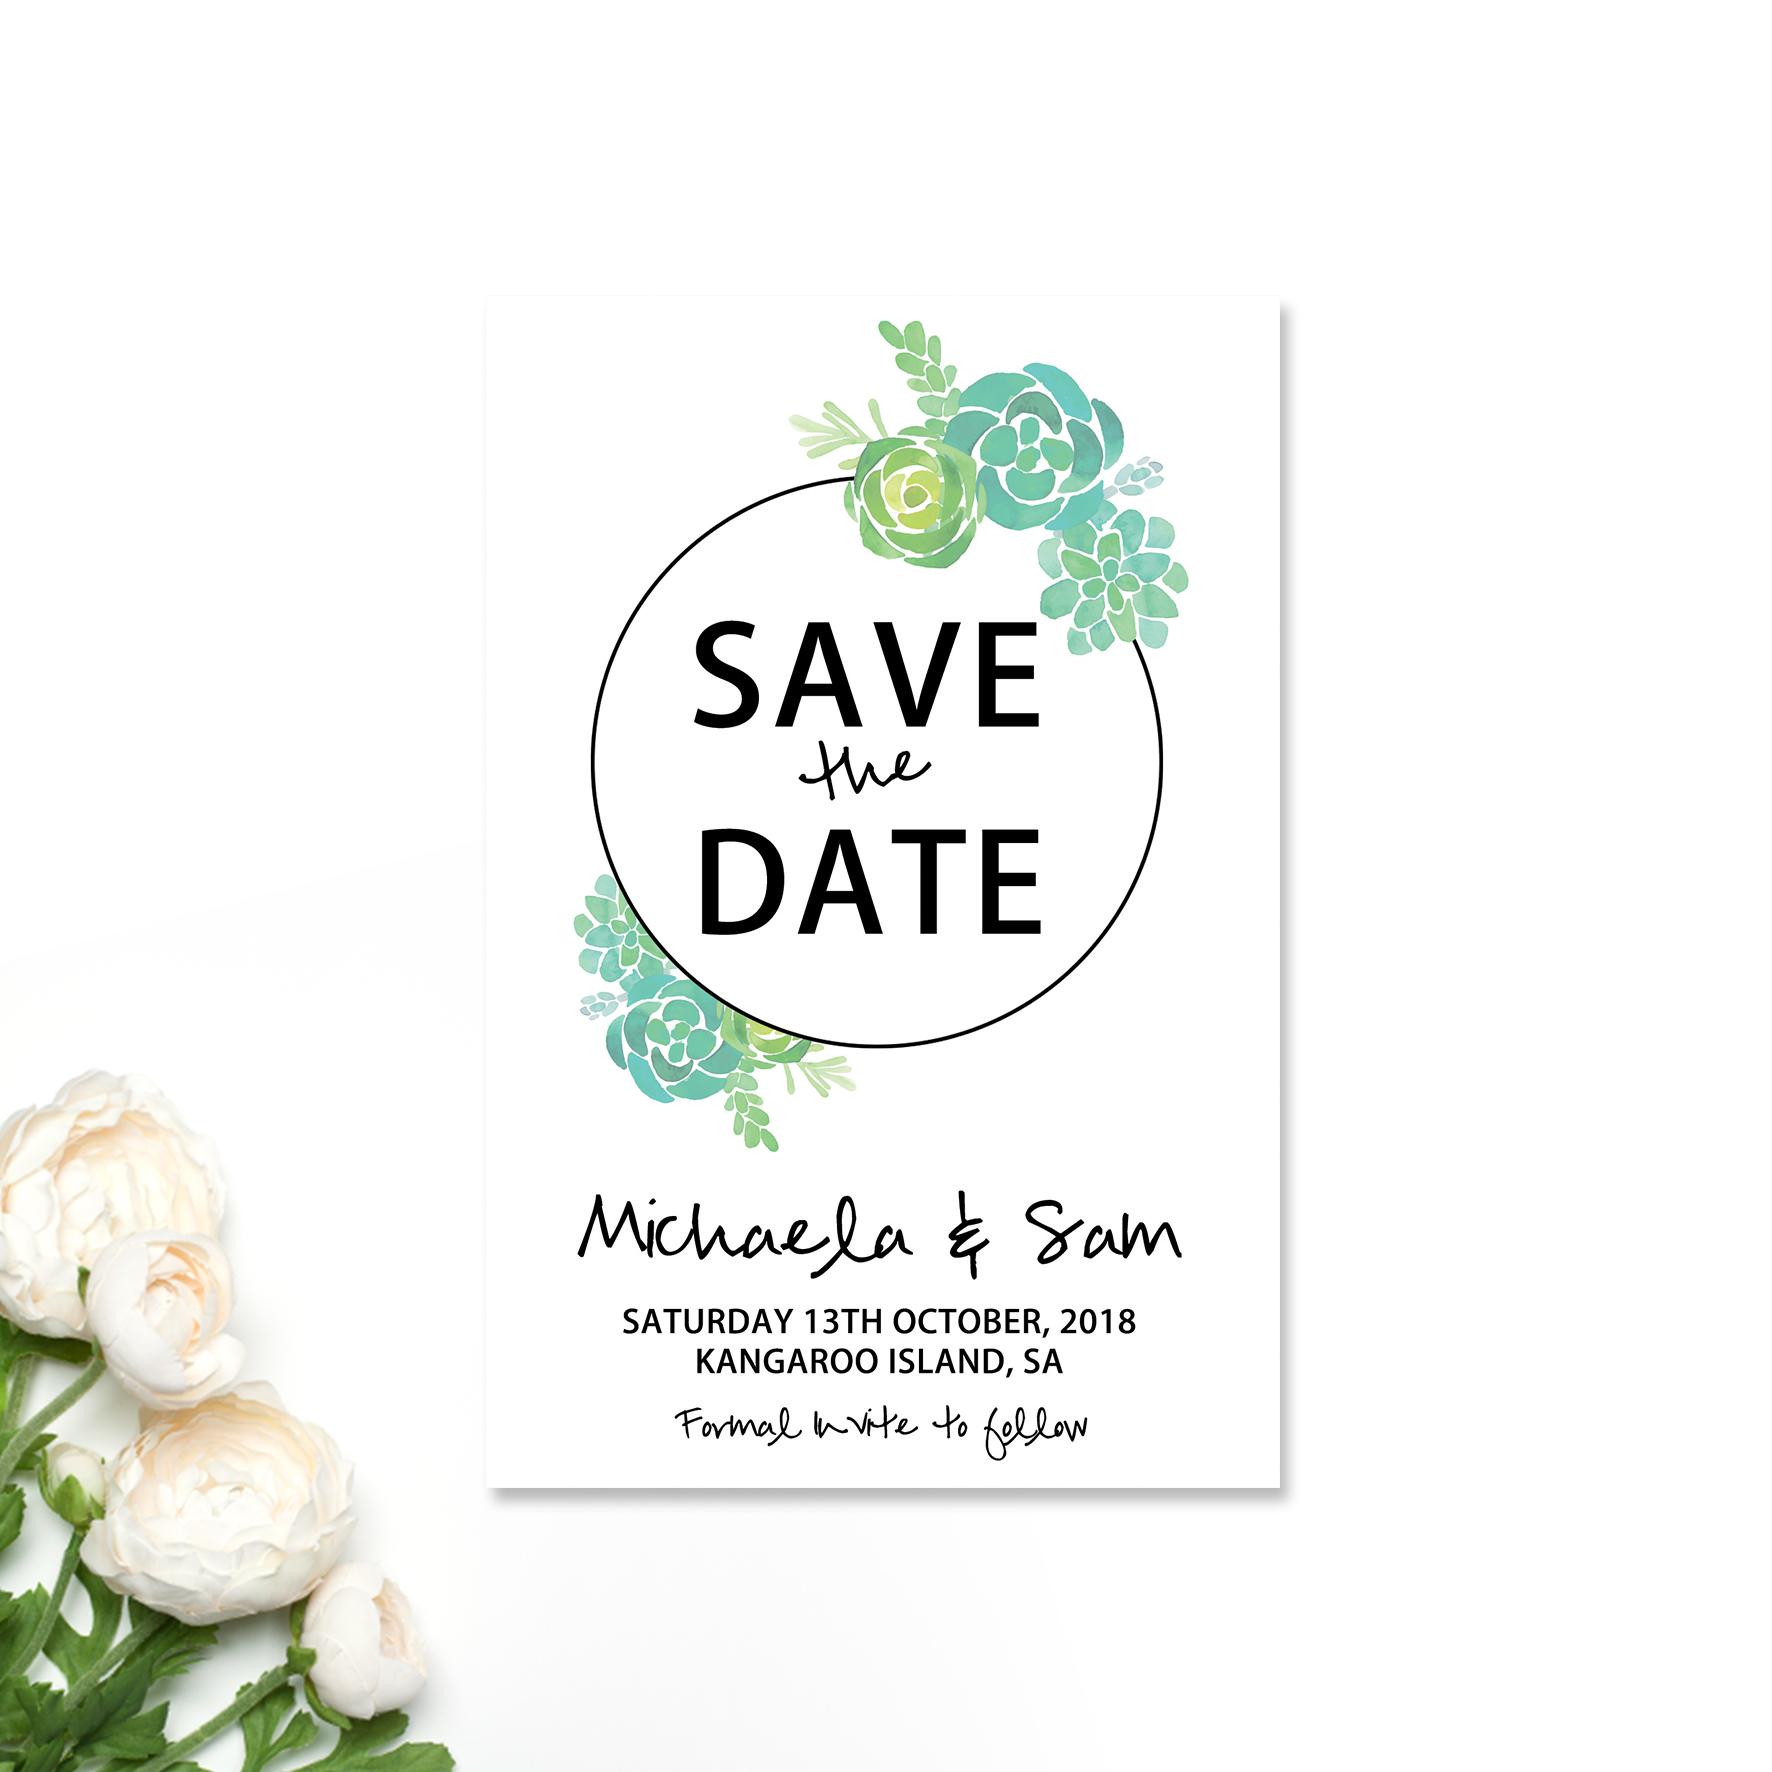 Michaela + Sam Save the Date Card